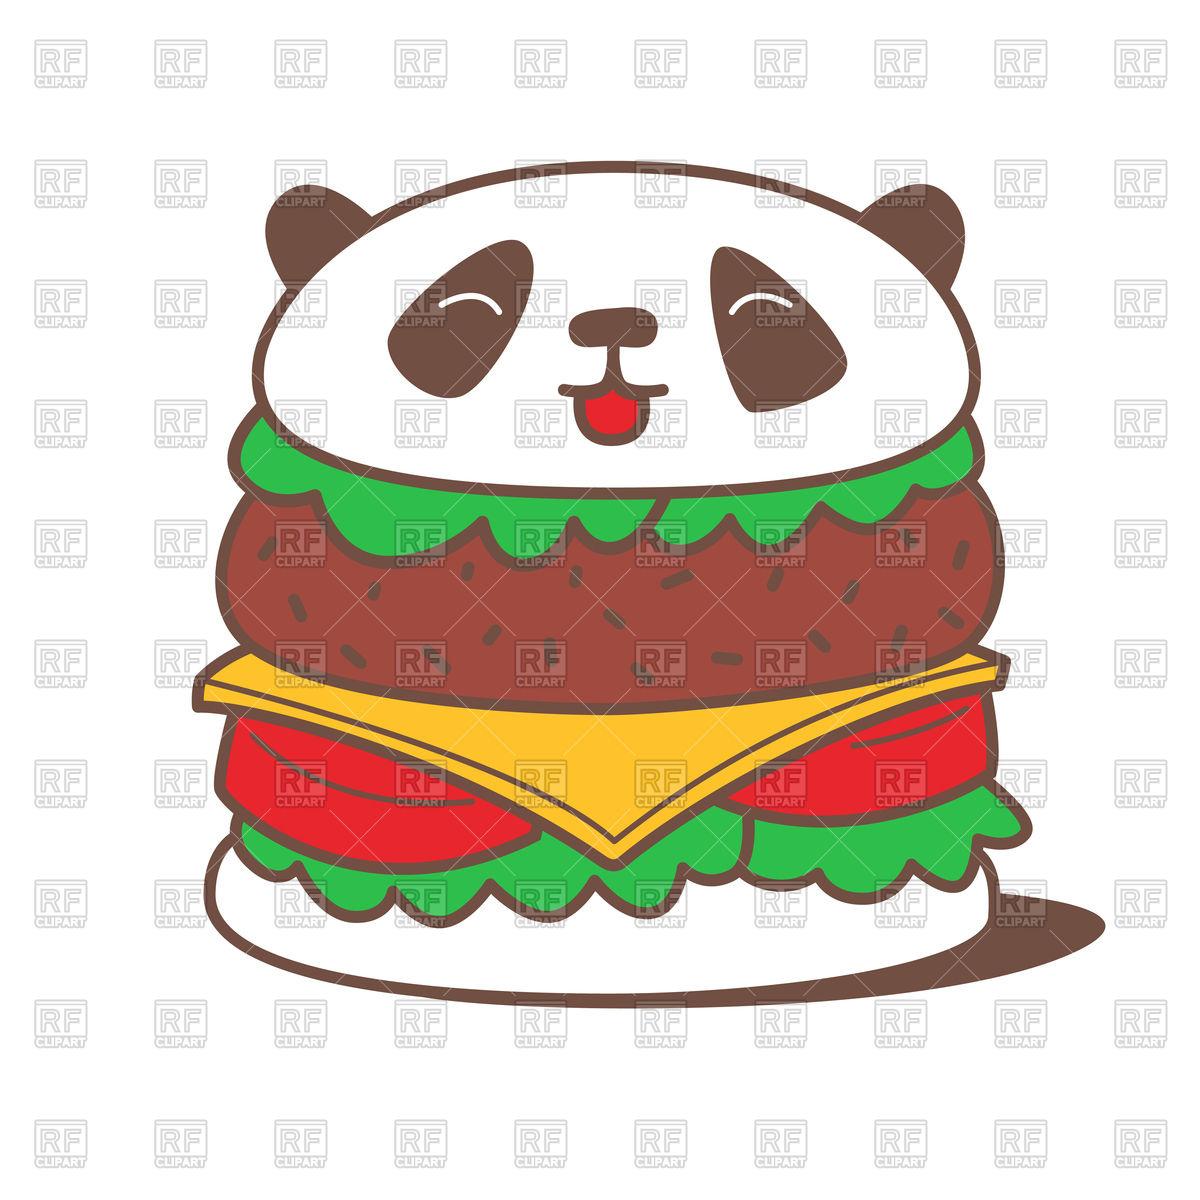 1200x1200 Funny Kawaii Burger With Panda Head Royalty Free Vector Clip Art